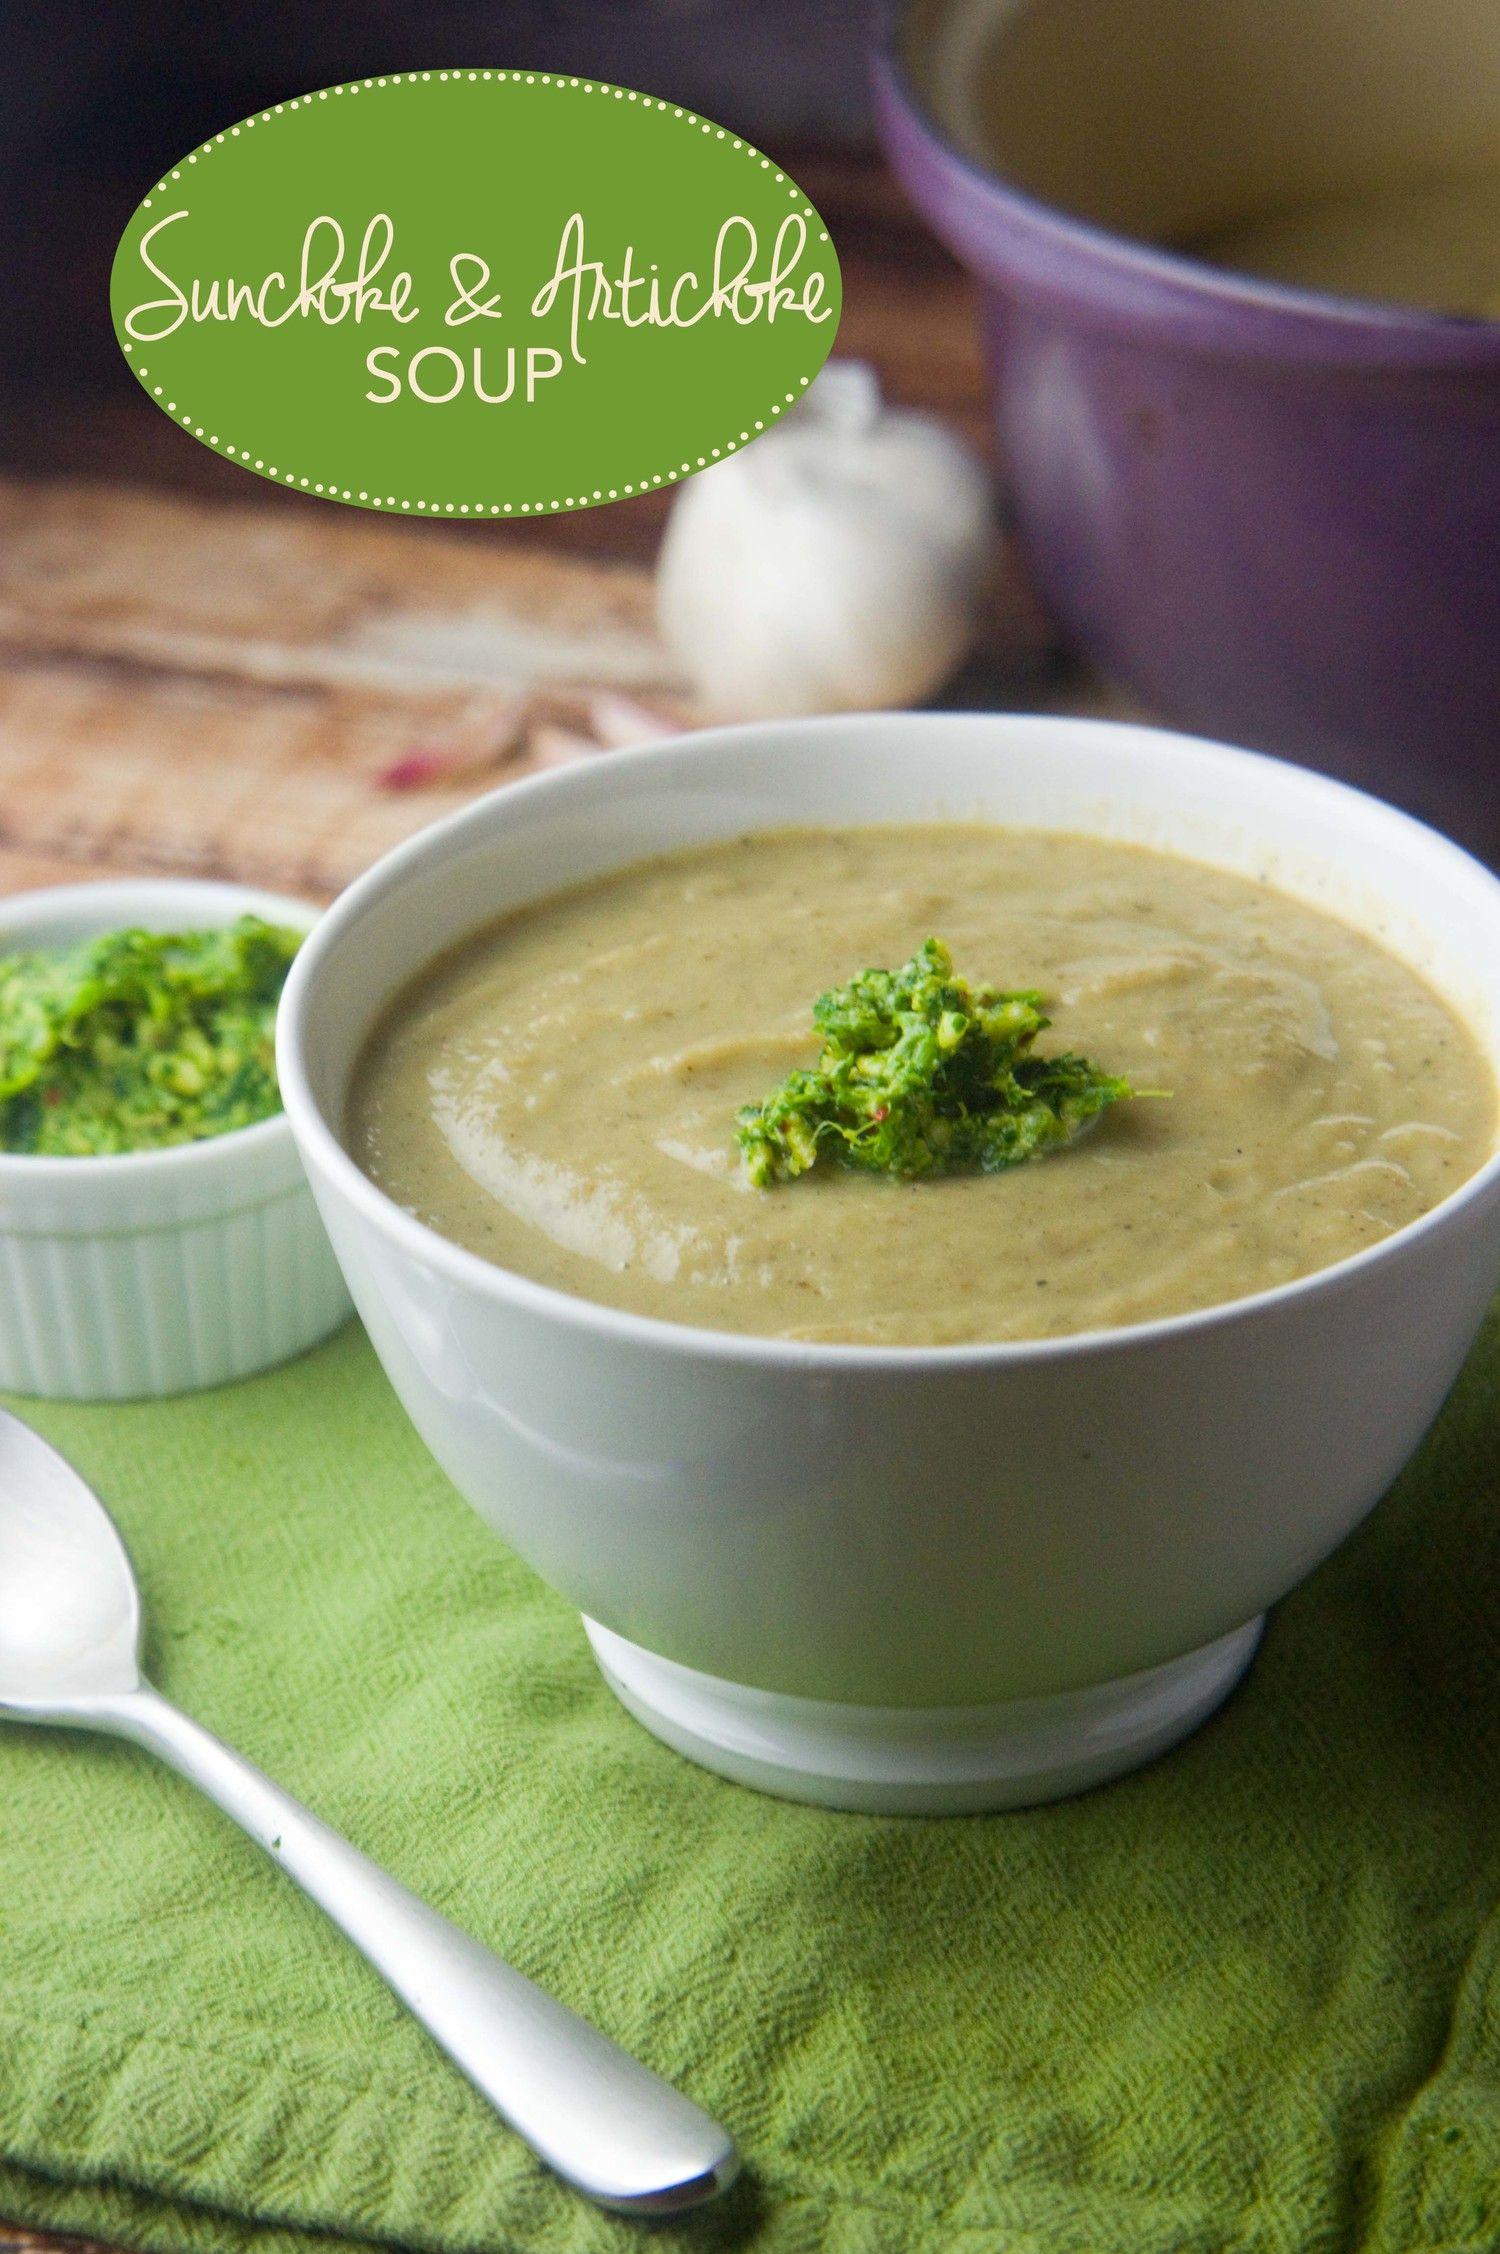 Sunchoke & Artichoke Soup — Foraged Dish